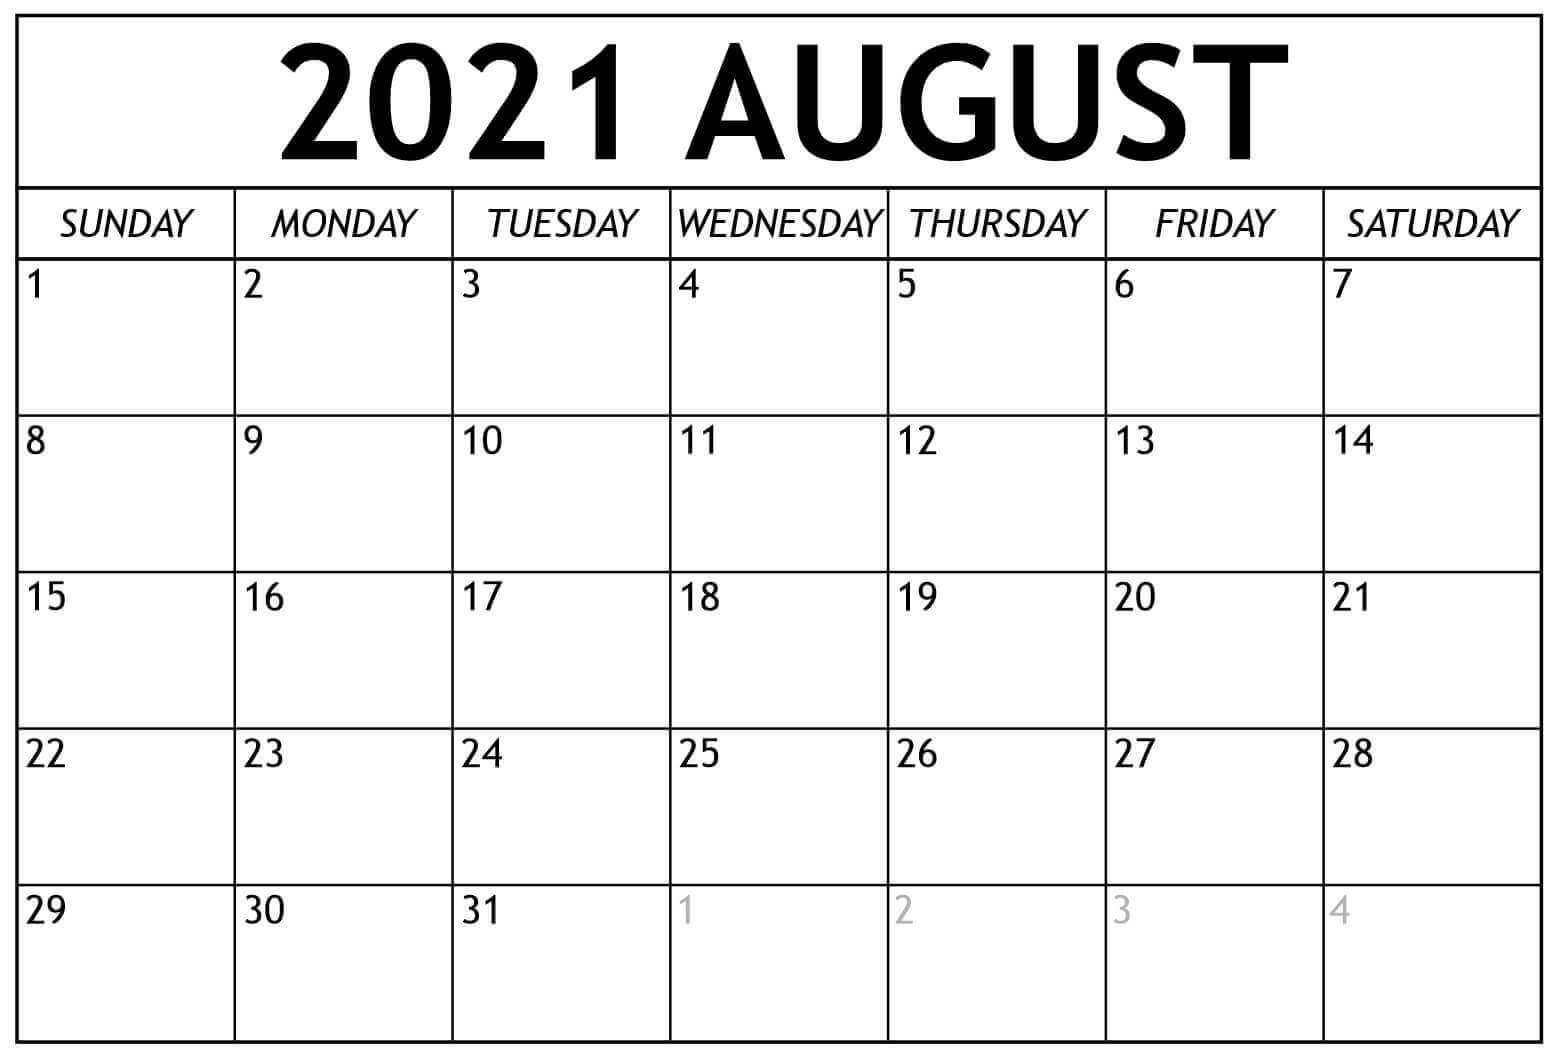 Fillable August 2021 Calendar Template Printable PDF Word